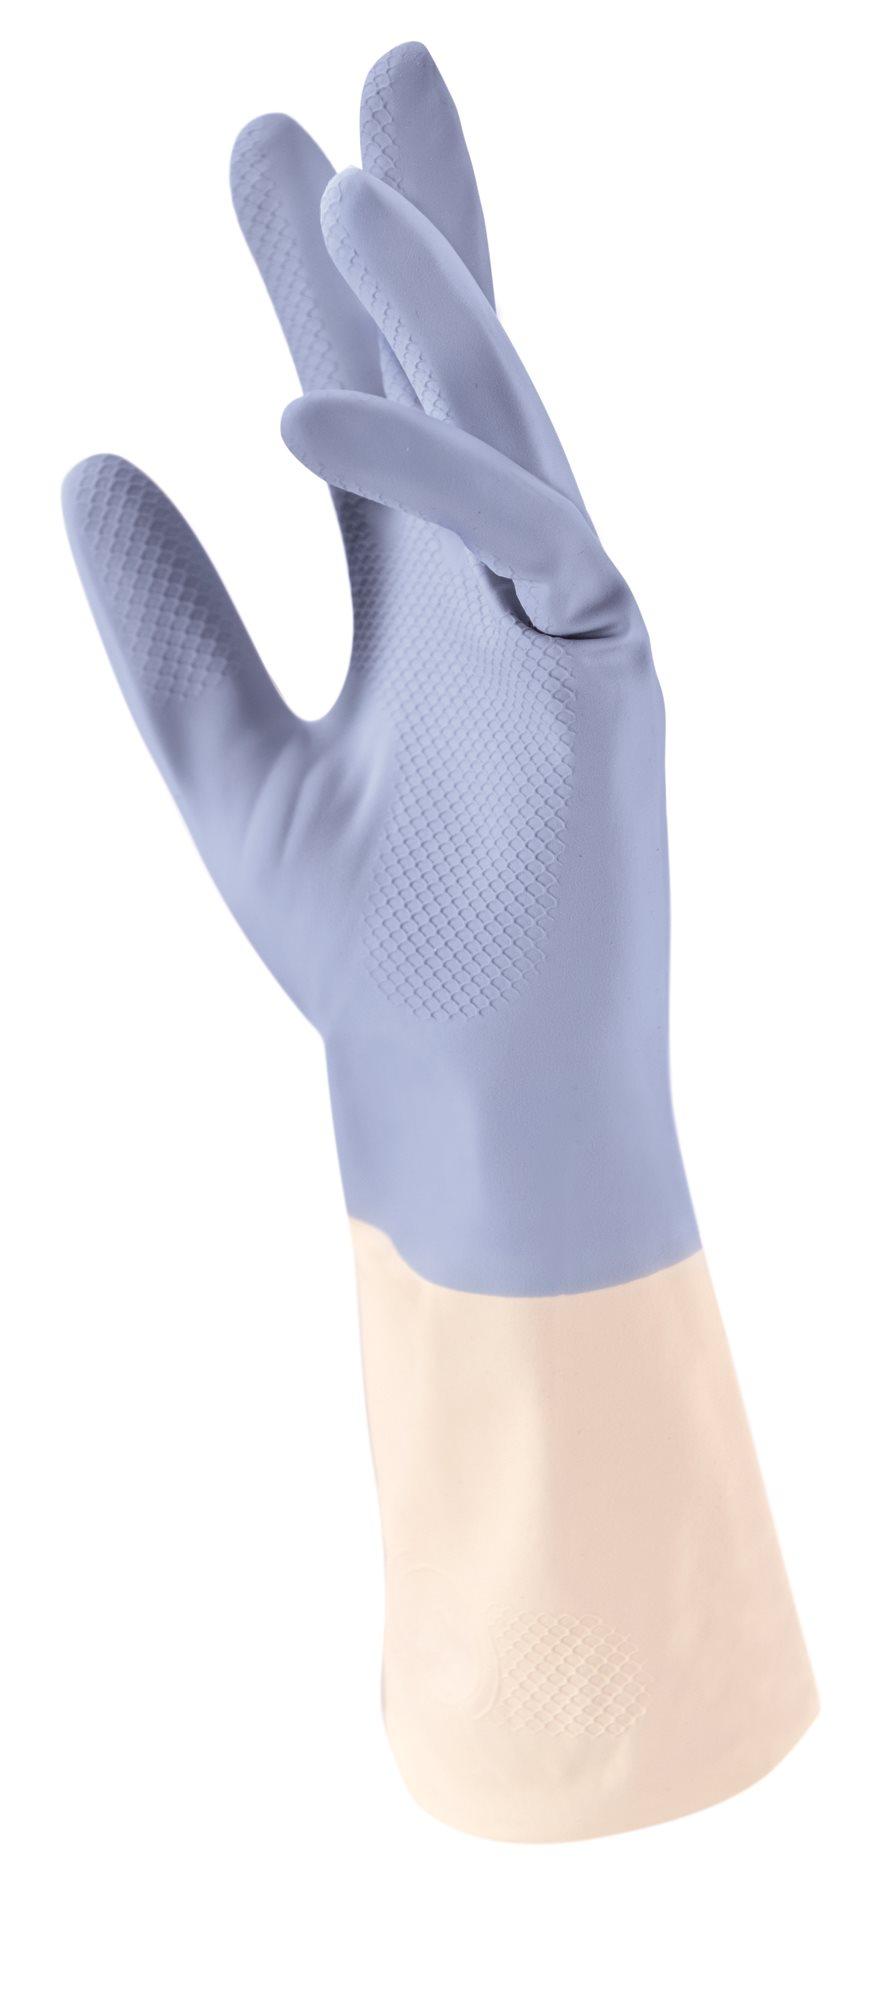 Tescoma Γάντια Lattex με Βαμβακερή Επίστρωση & Αλόη Profimate Small